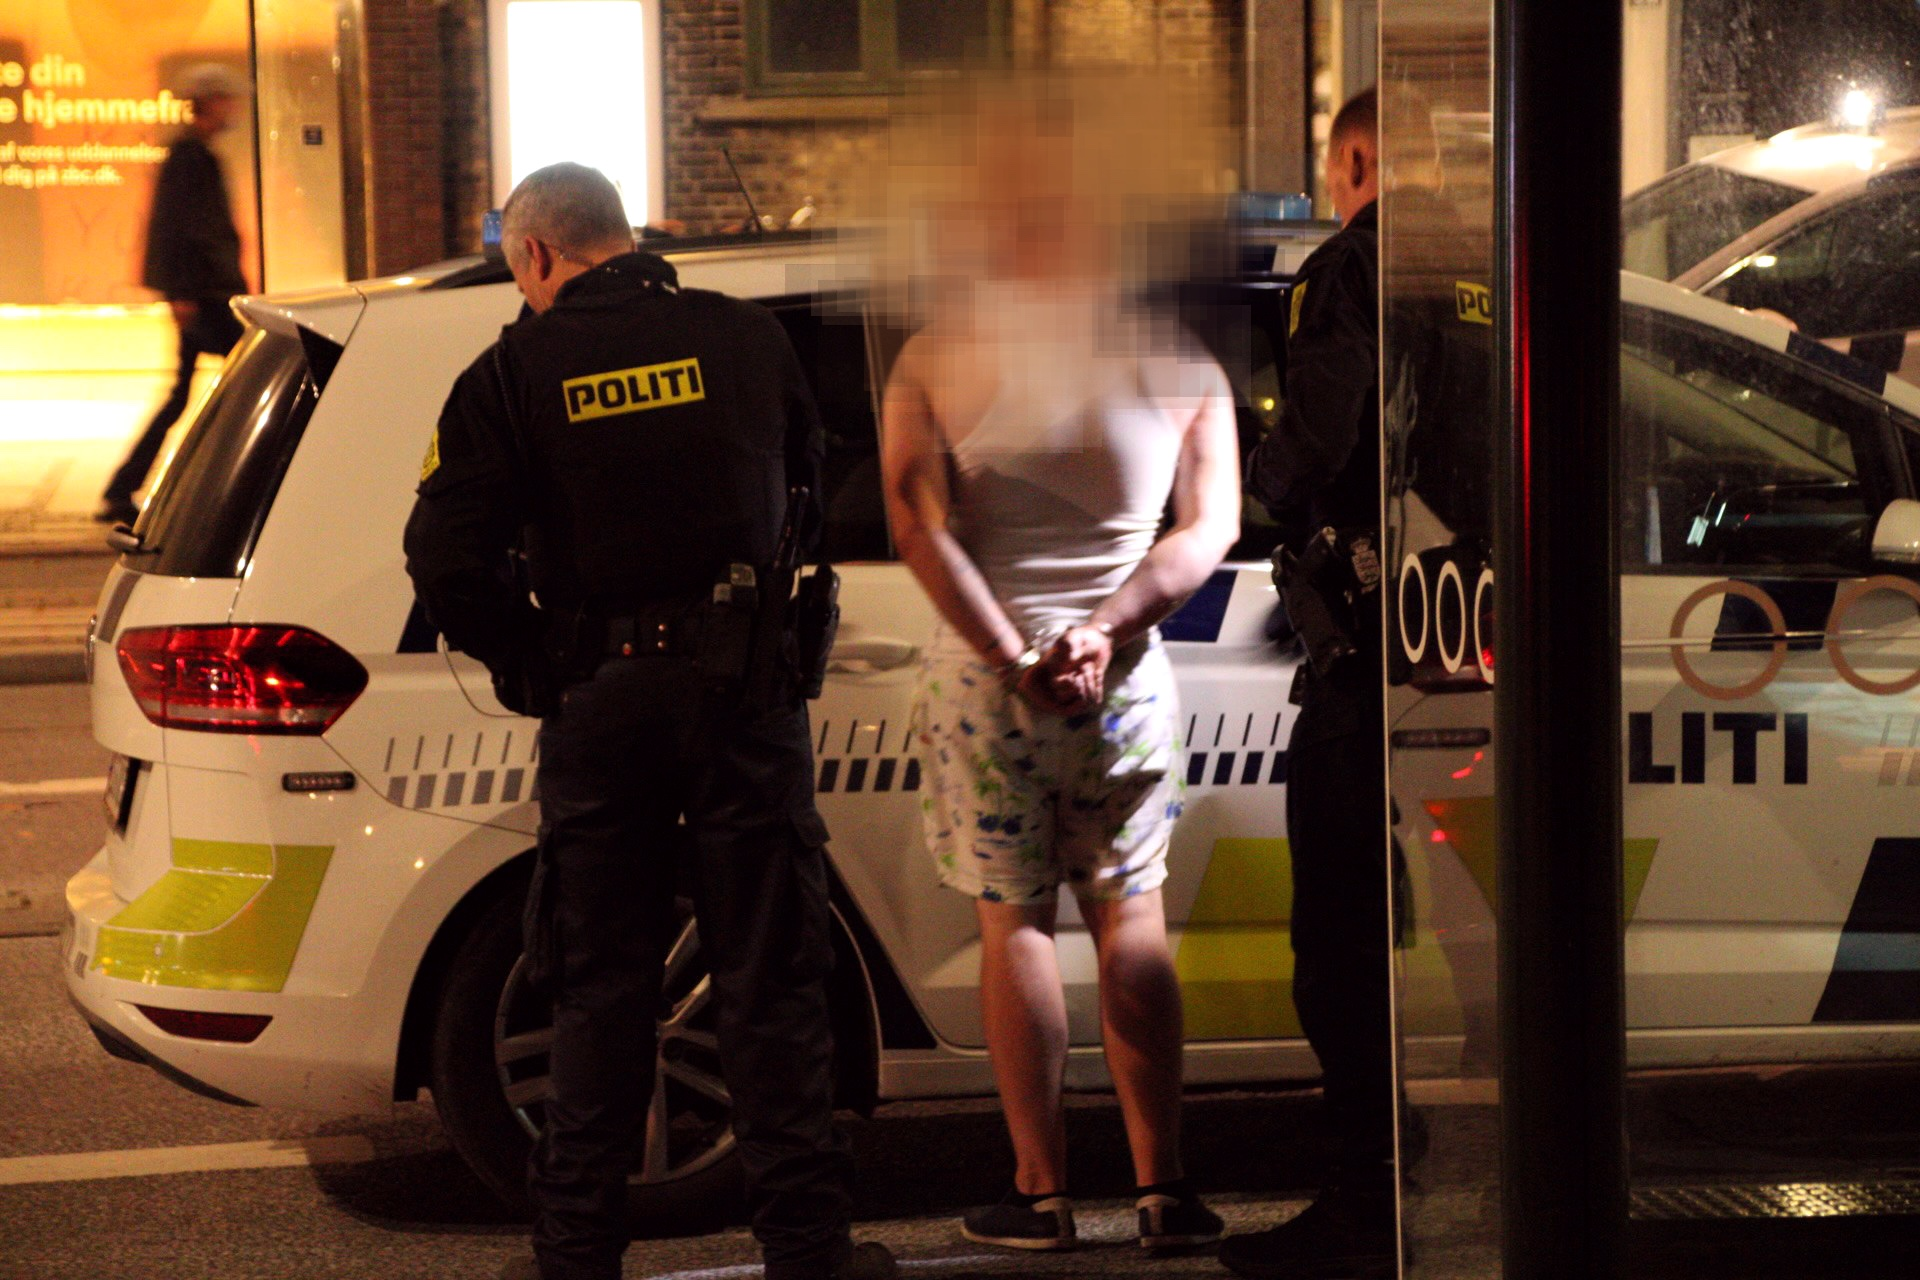 Uro og anholdelse i Roskilde